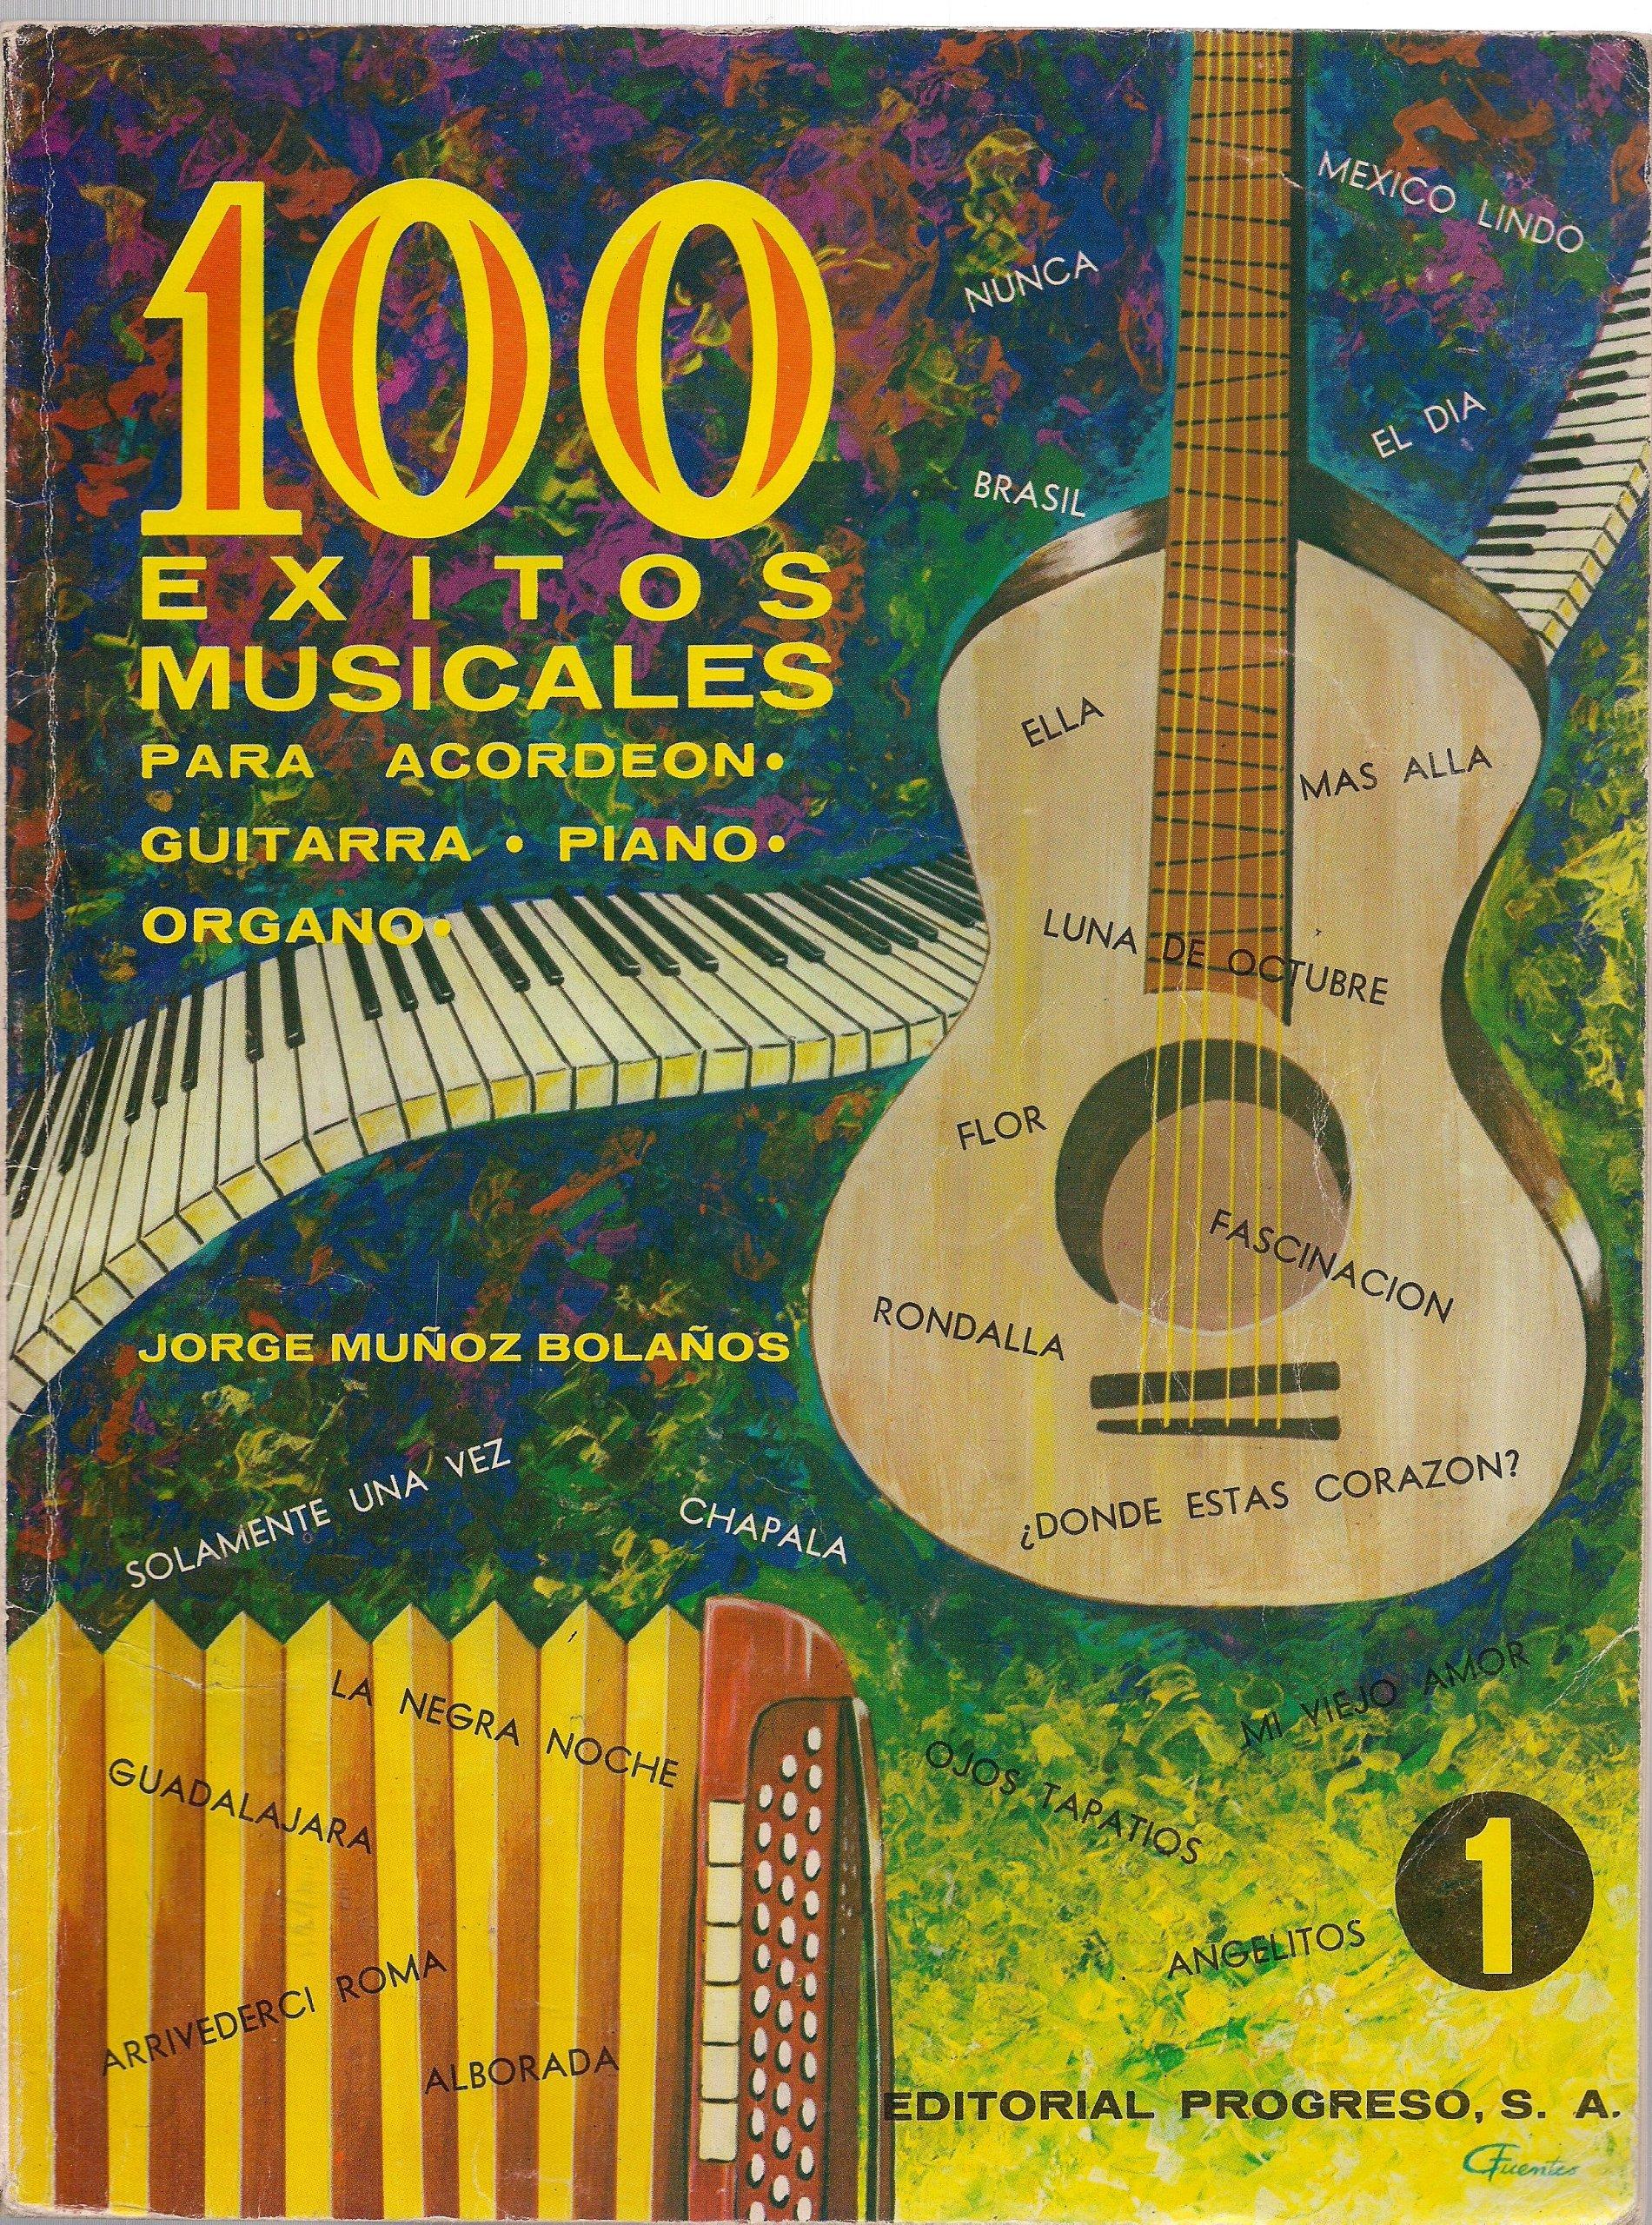 100 Exitos Musicales Para Acordeon, Guitarra, Piano, Organo (Spanish) Paperback – 1968